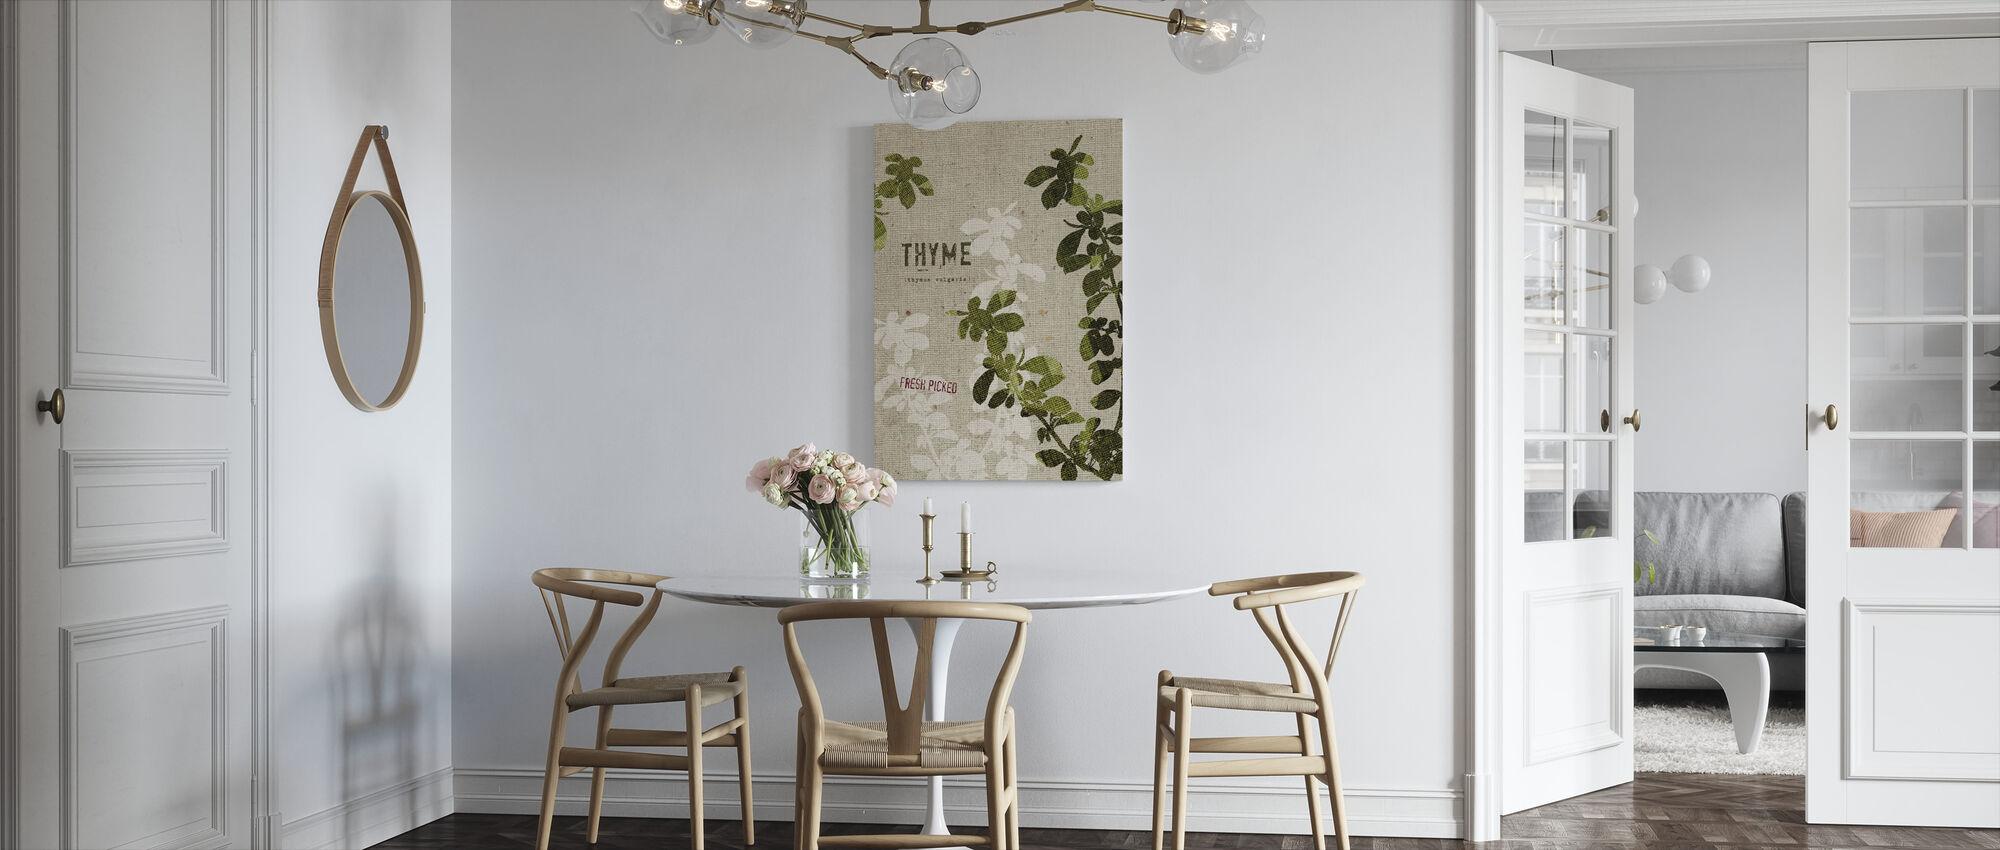 Organische tijm - Canvas print - Keuken